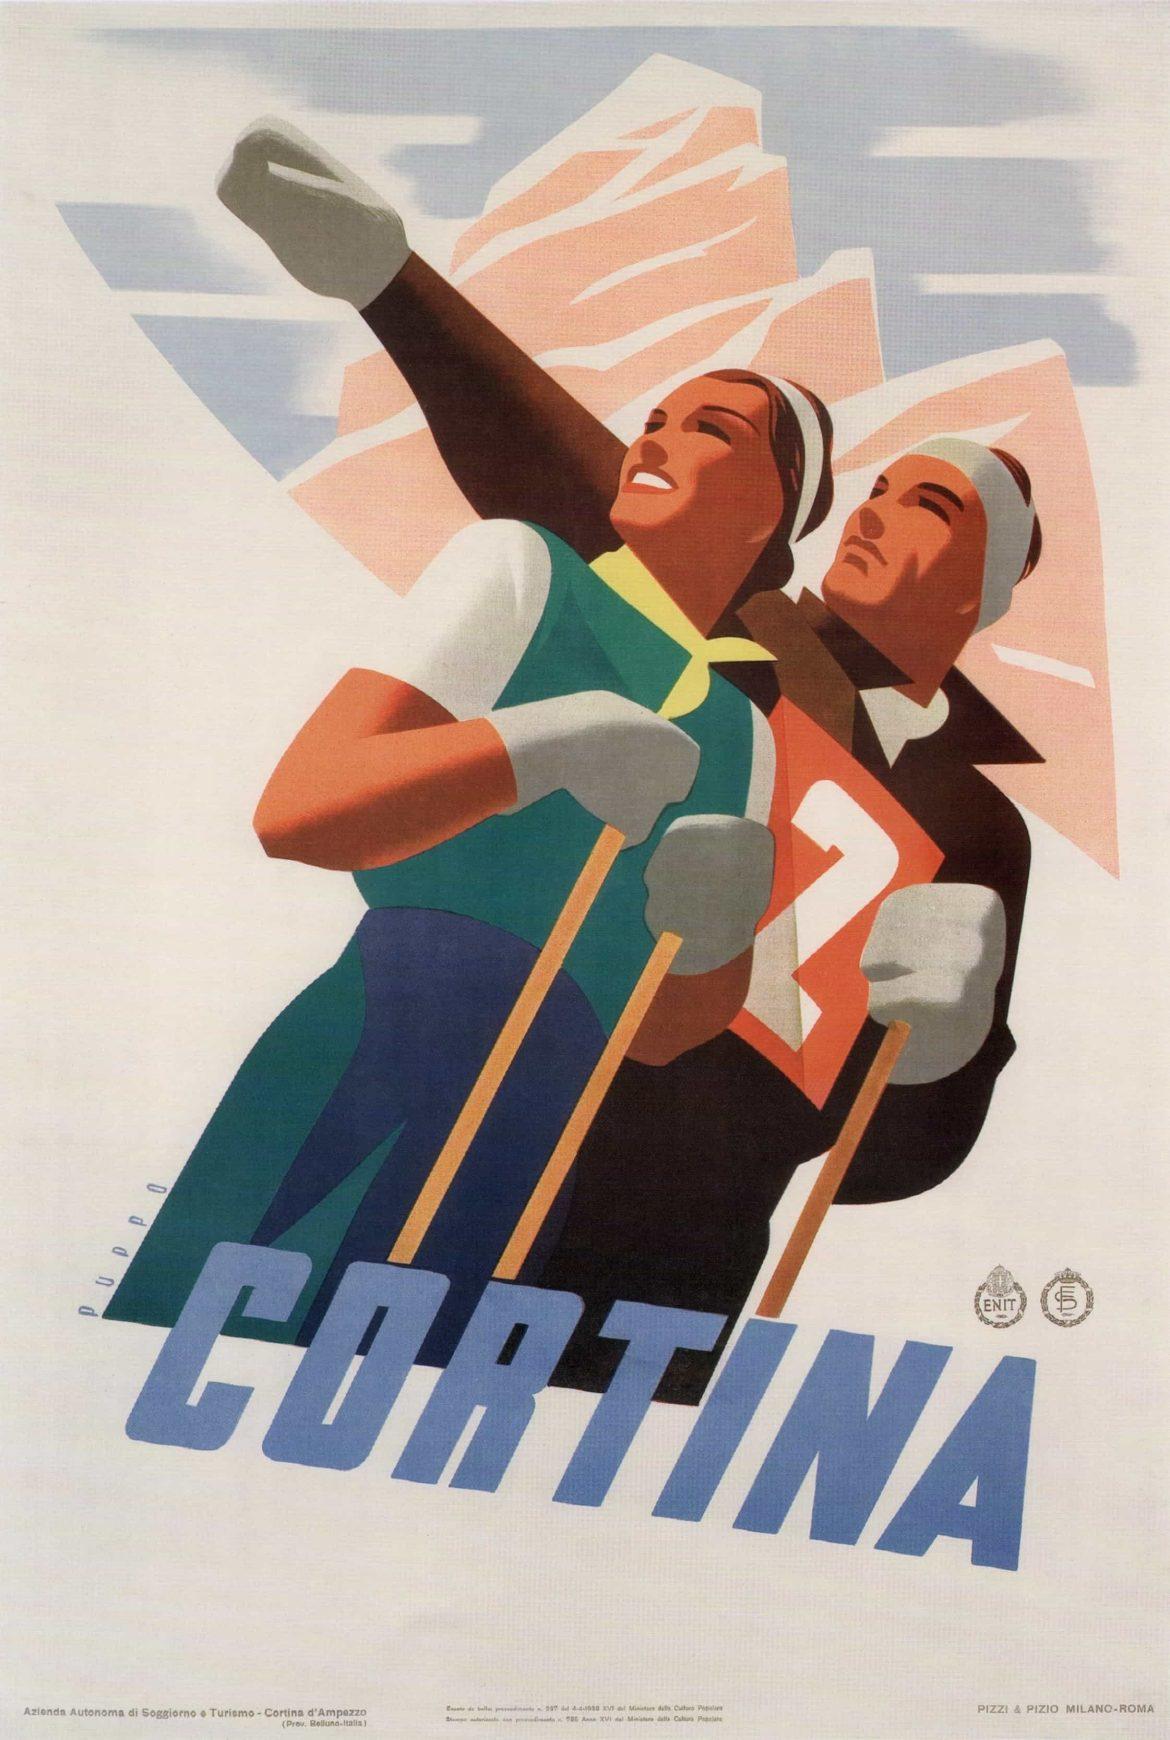 Cortina Italy Skiing Winter Tourism Poster, 1938